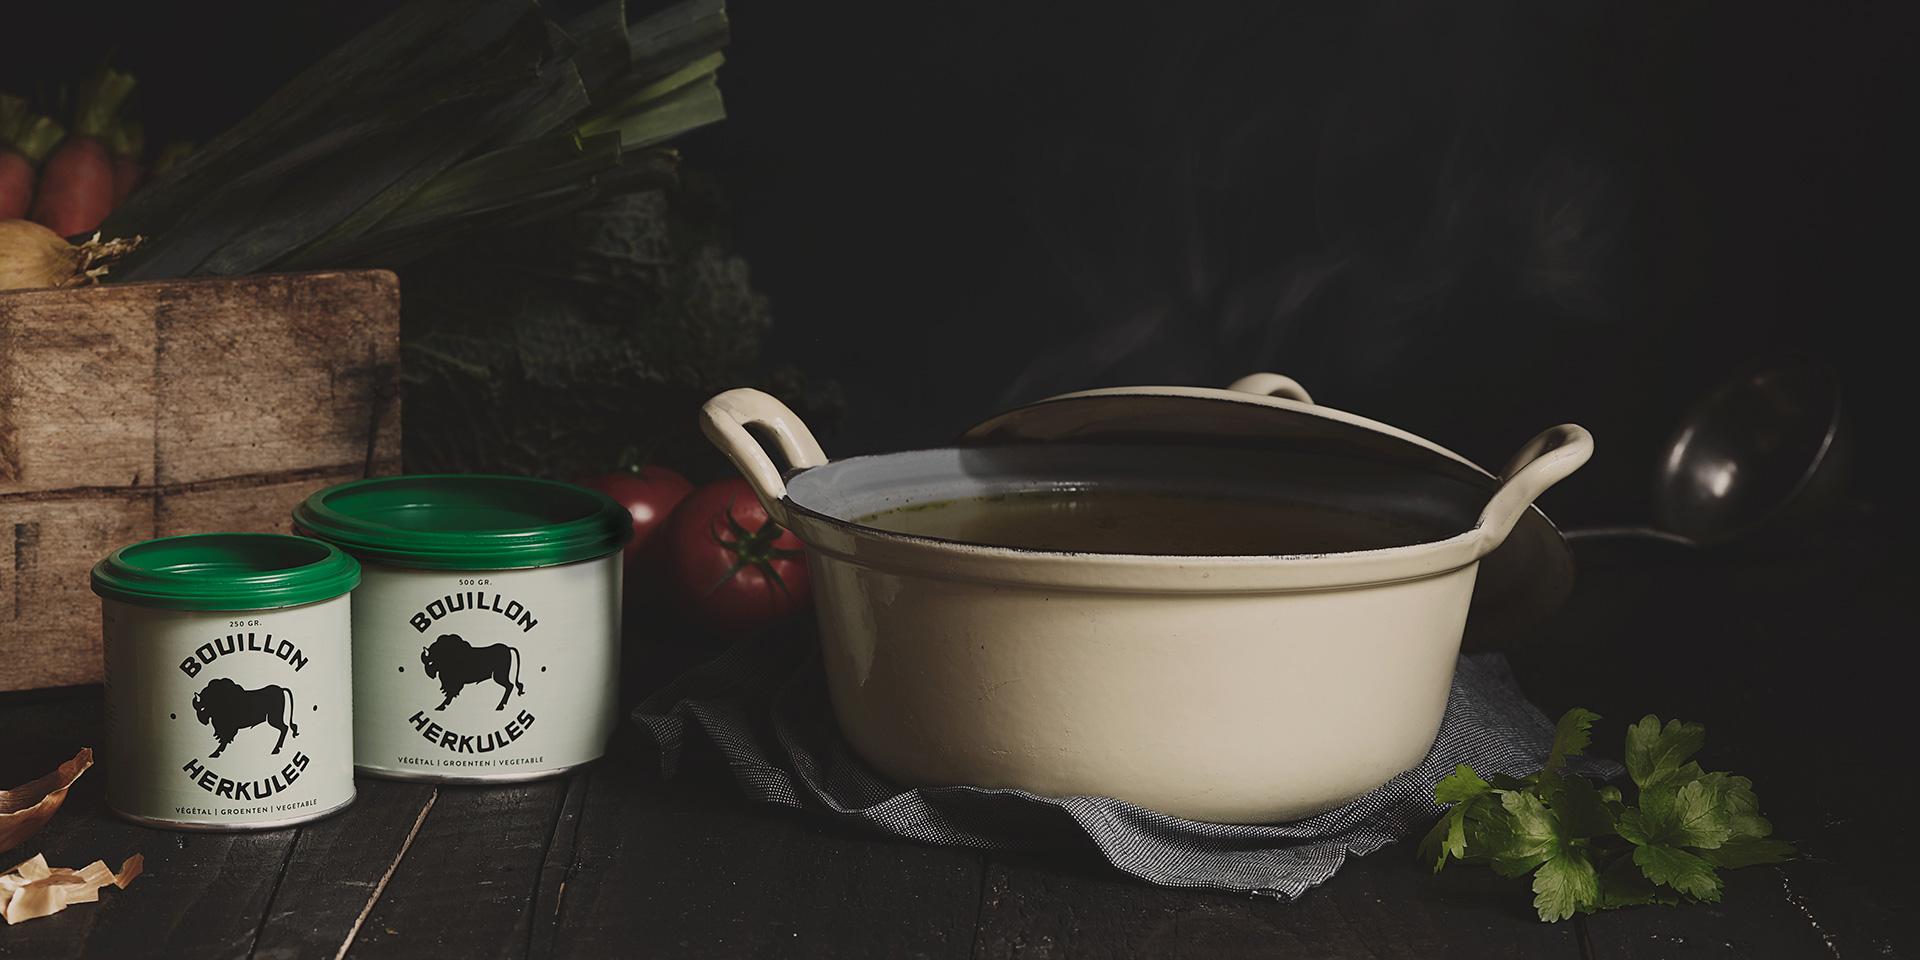 bouillon-herkules-gent-groenten-header